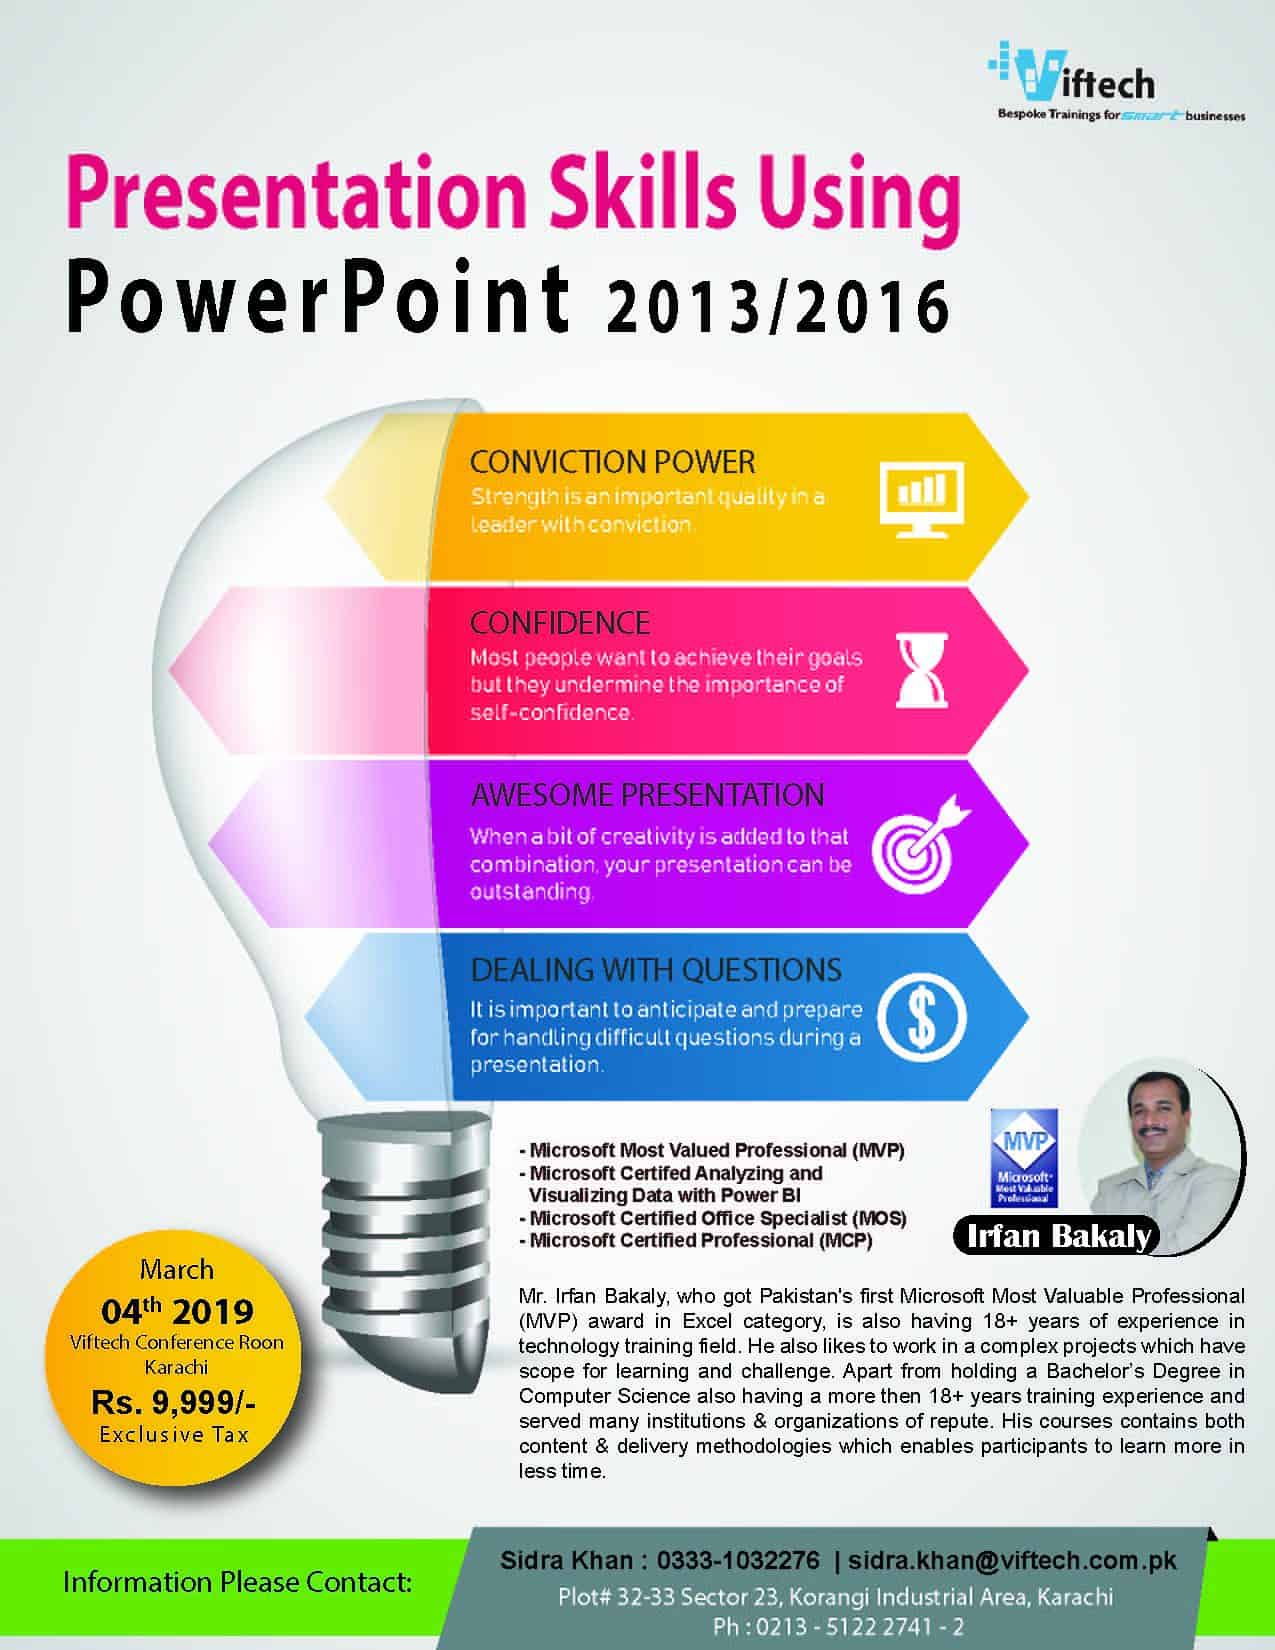 Presentation Skills Using PowerPoint